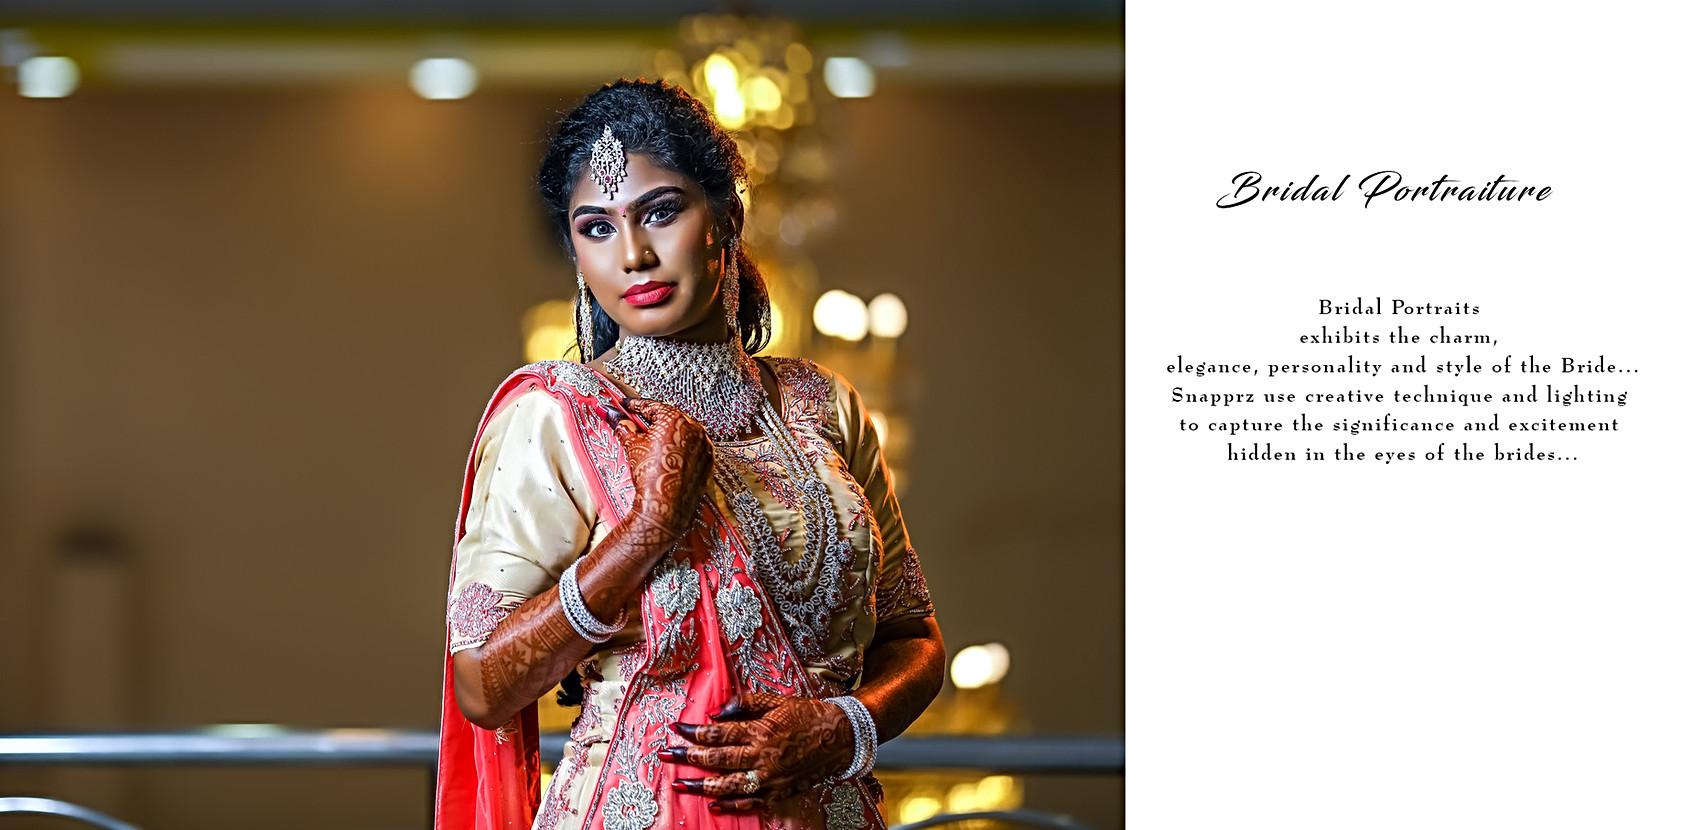 Bridal Portraiture.jpg